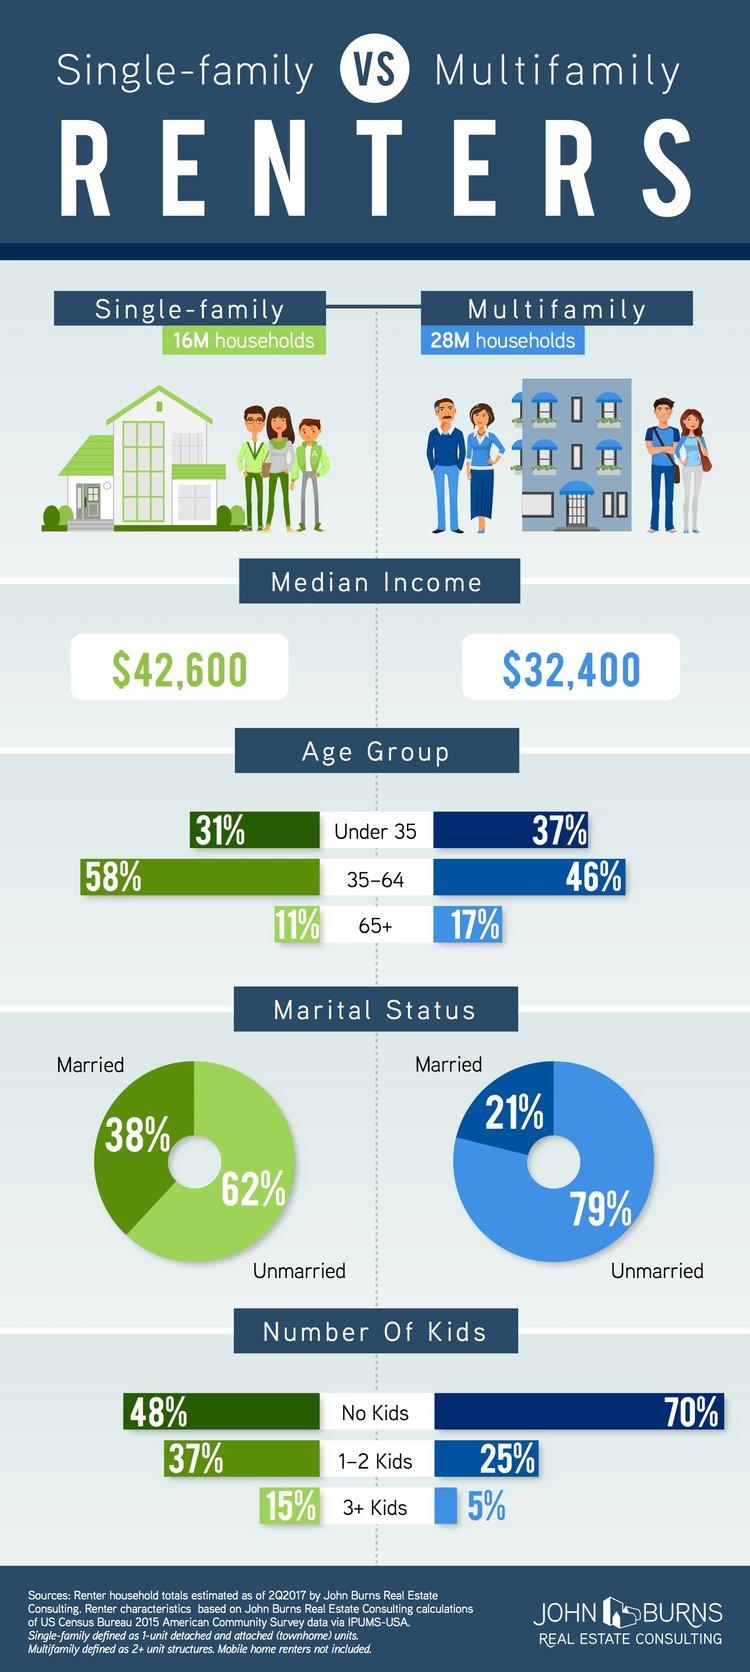 SFR-vs-Apartment_infographic_V3 2-1.jpg